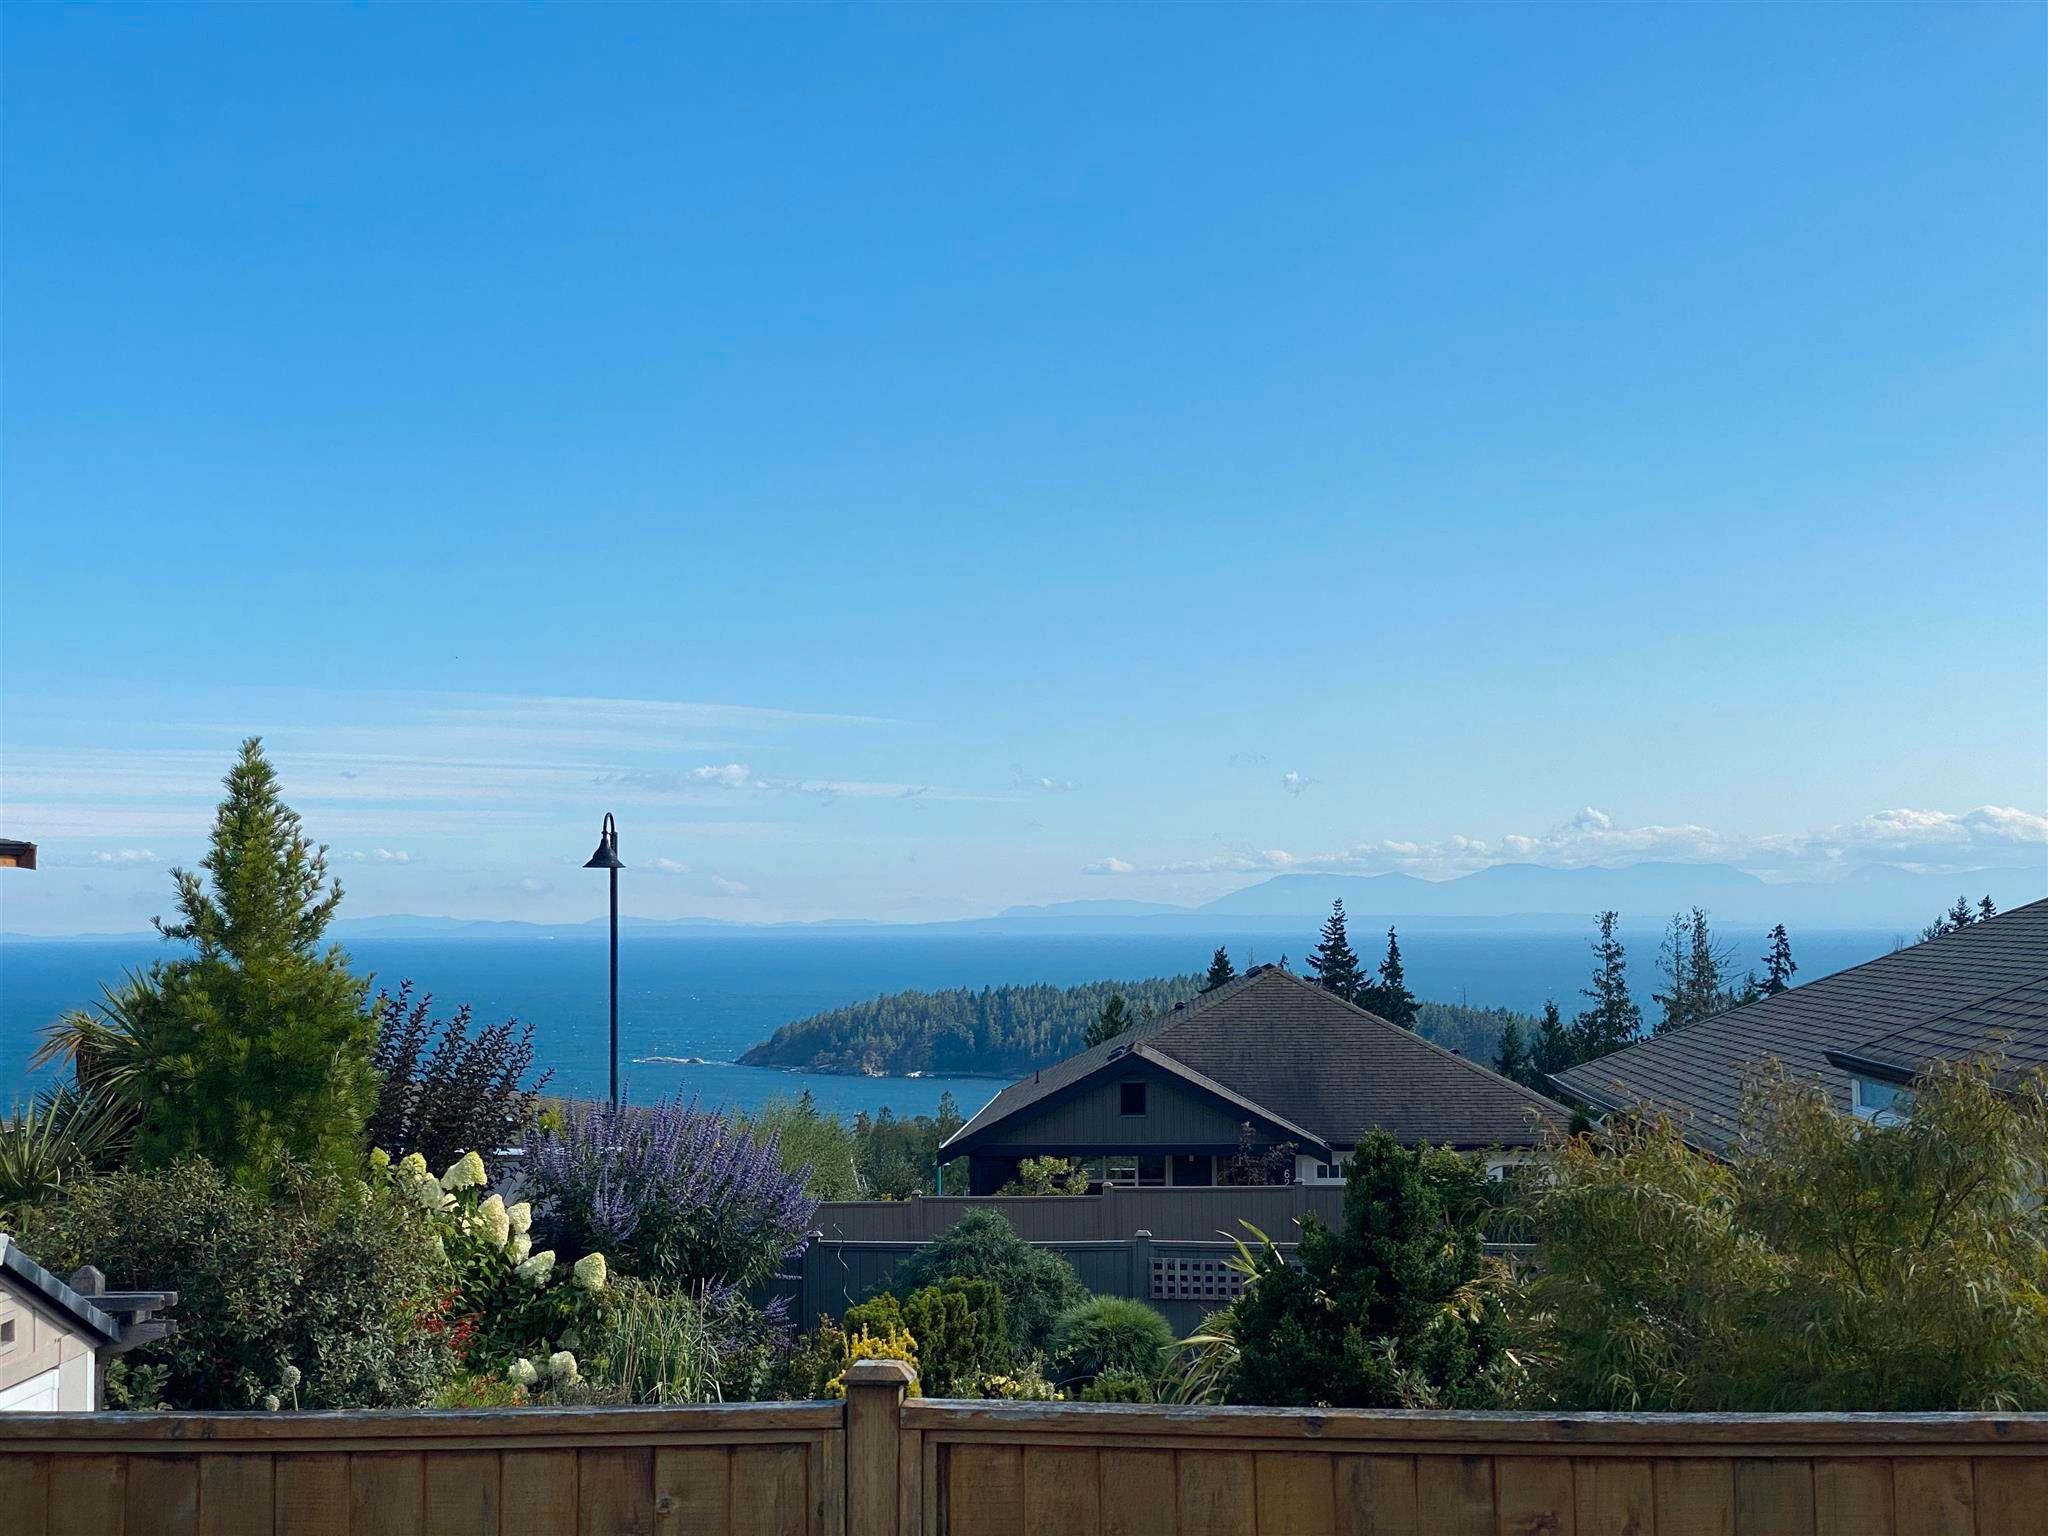 Main Photo: 5628 PETERS Crescent in Sechelt: Sechelt District House for sale (Sunshine Coast)  : MLS®# R2608126